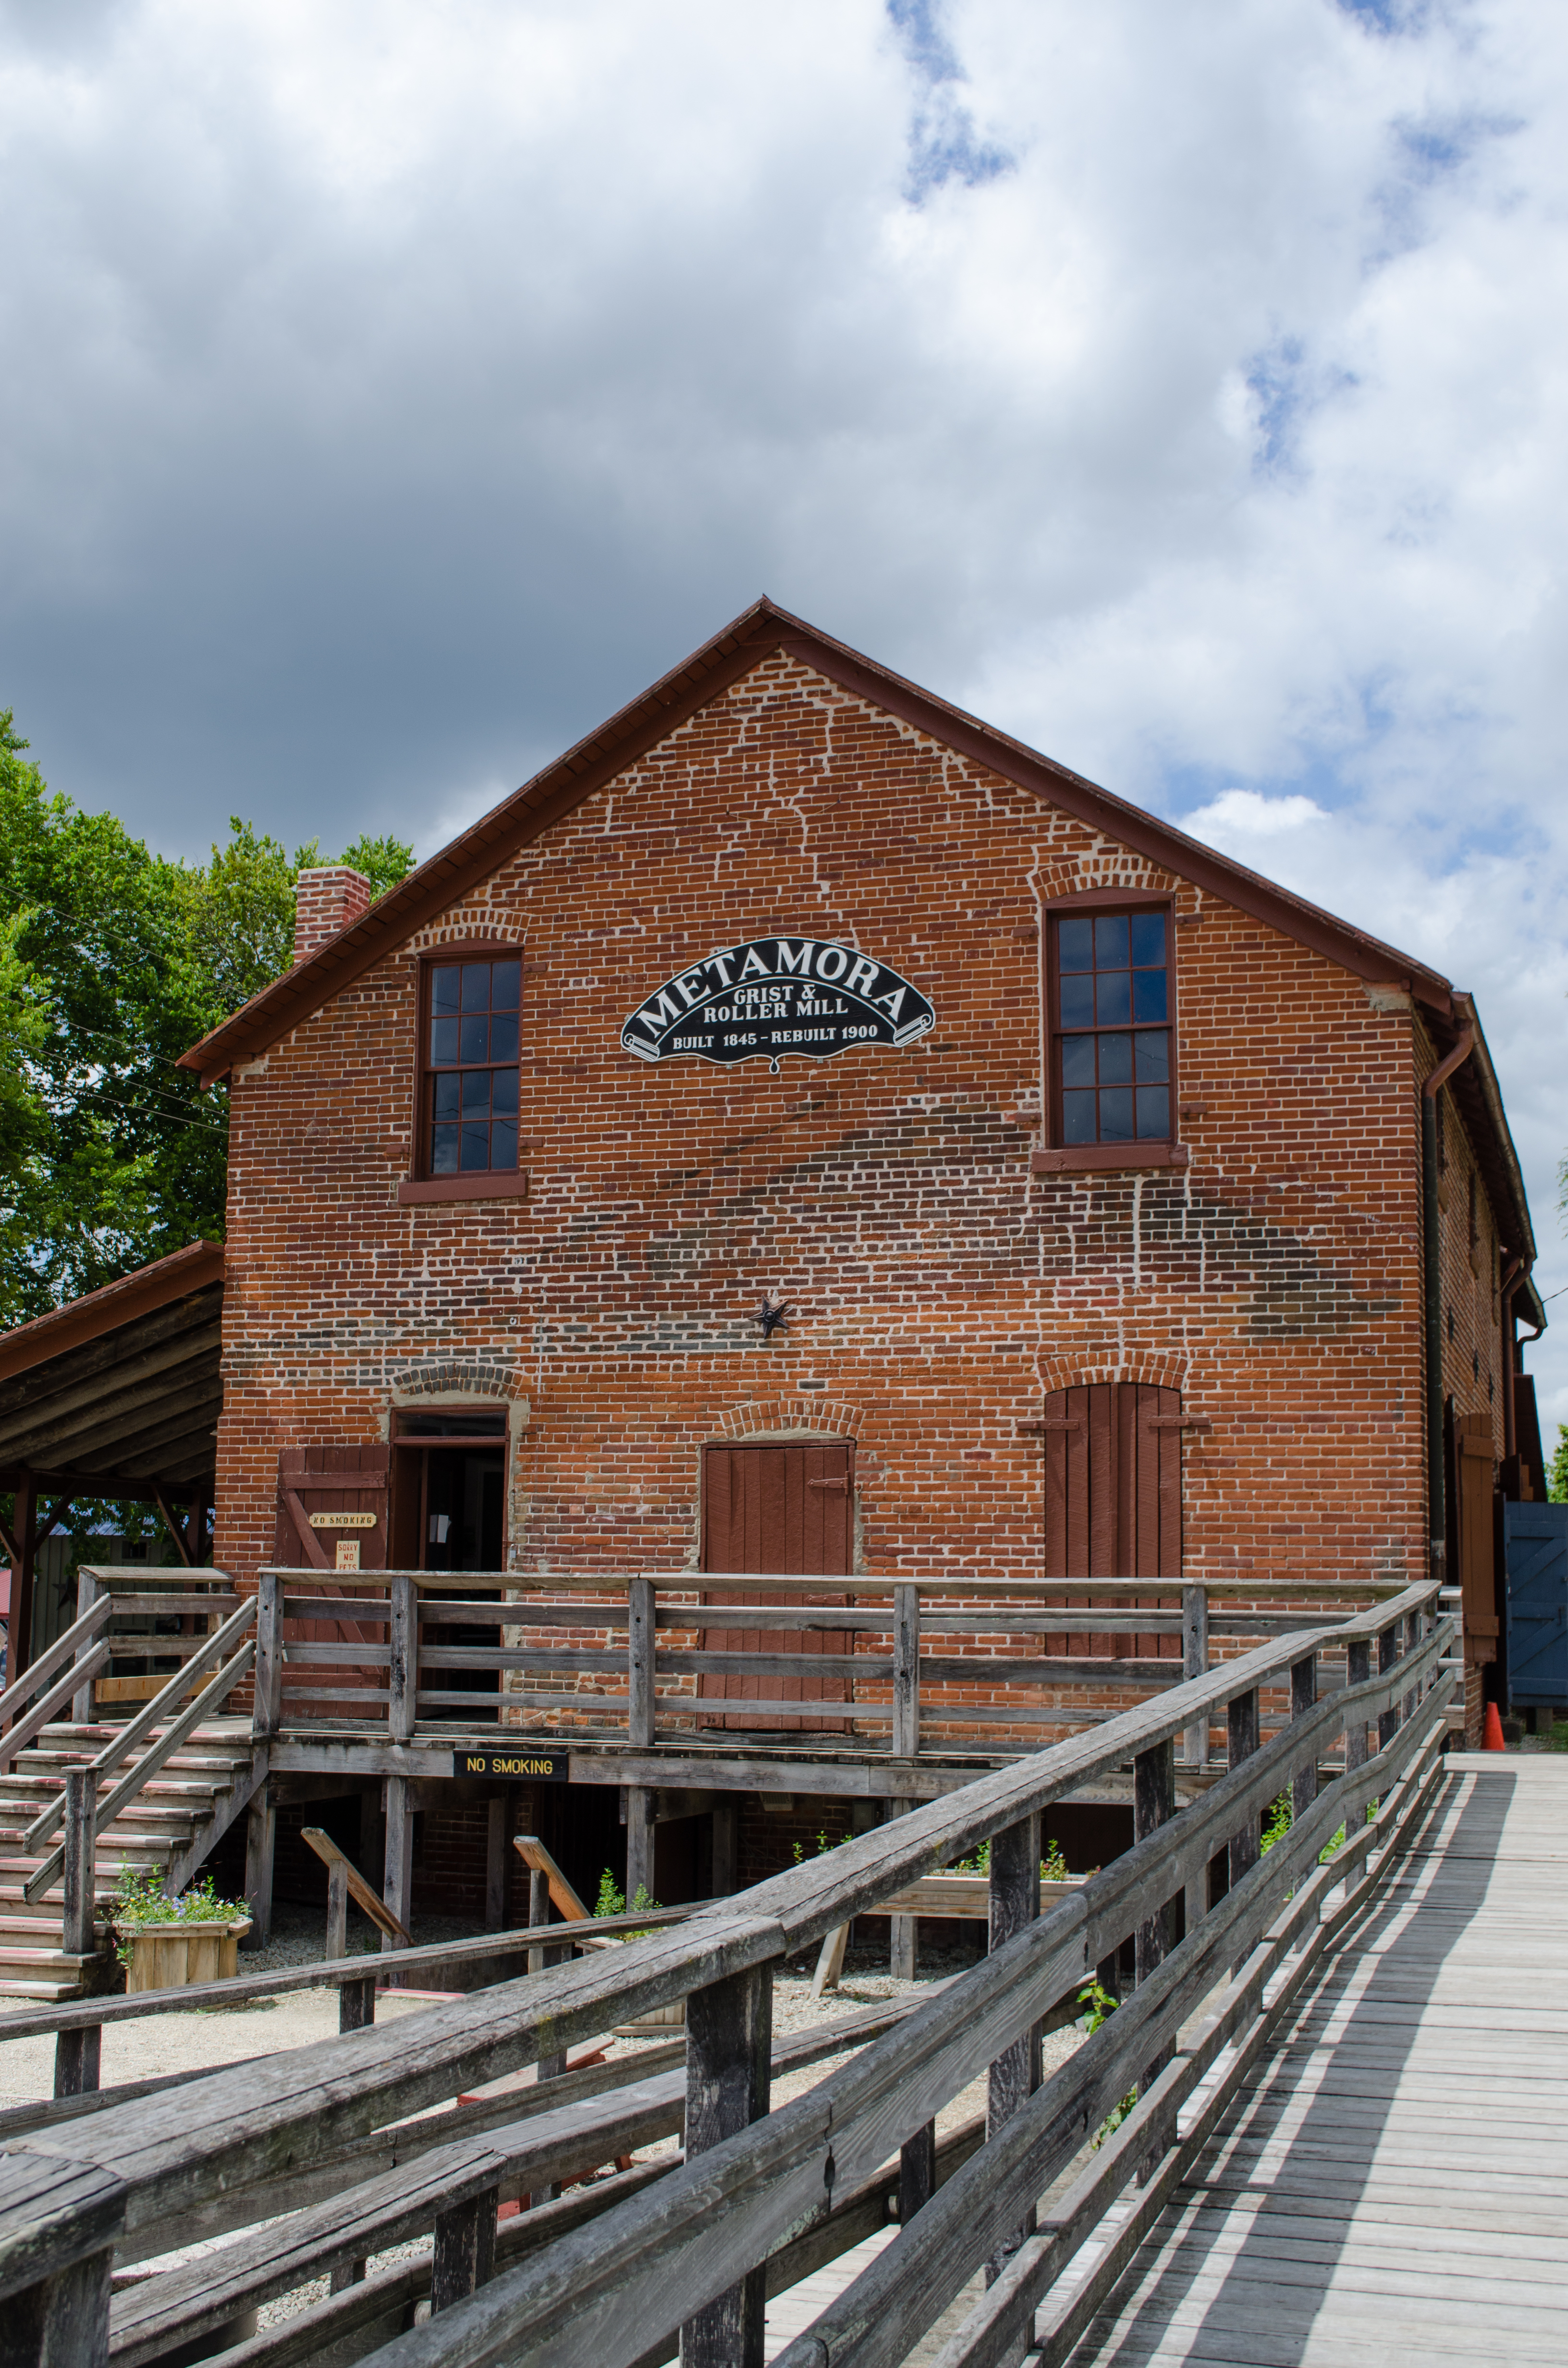 Grist Mill Metamora, Indiana